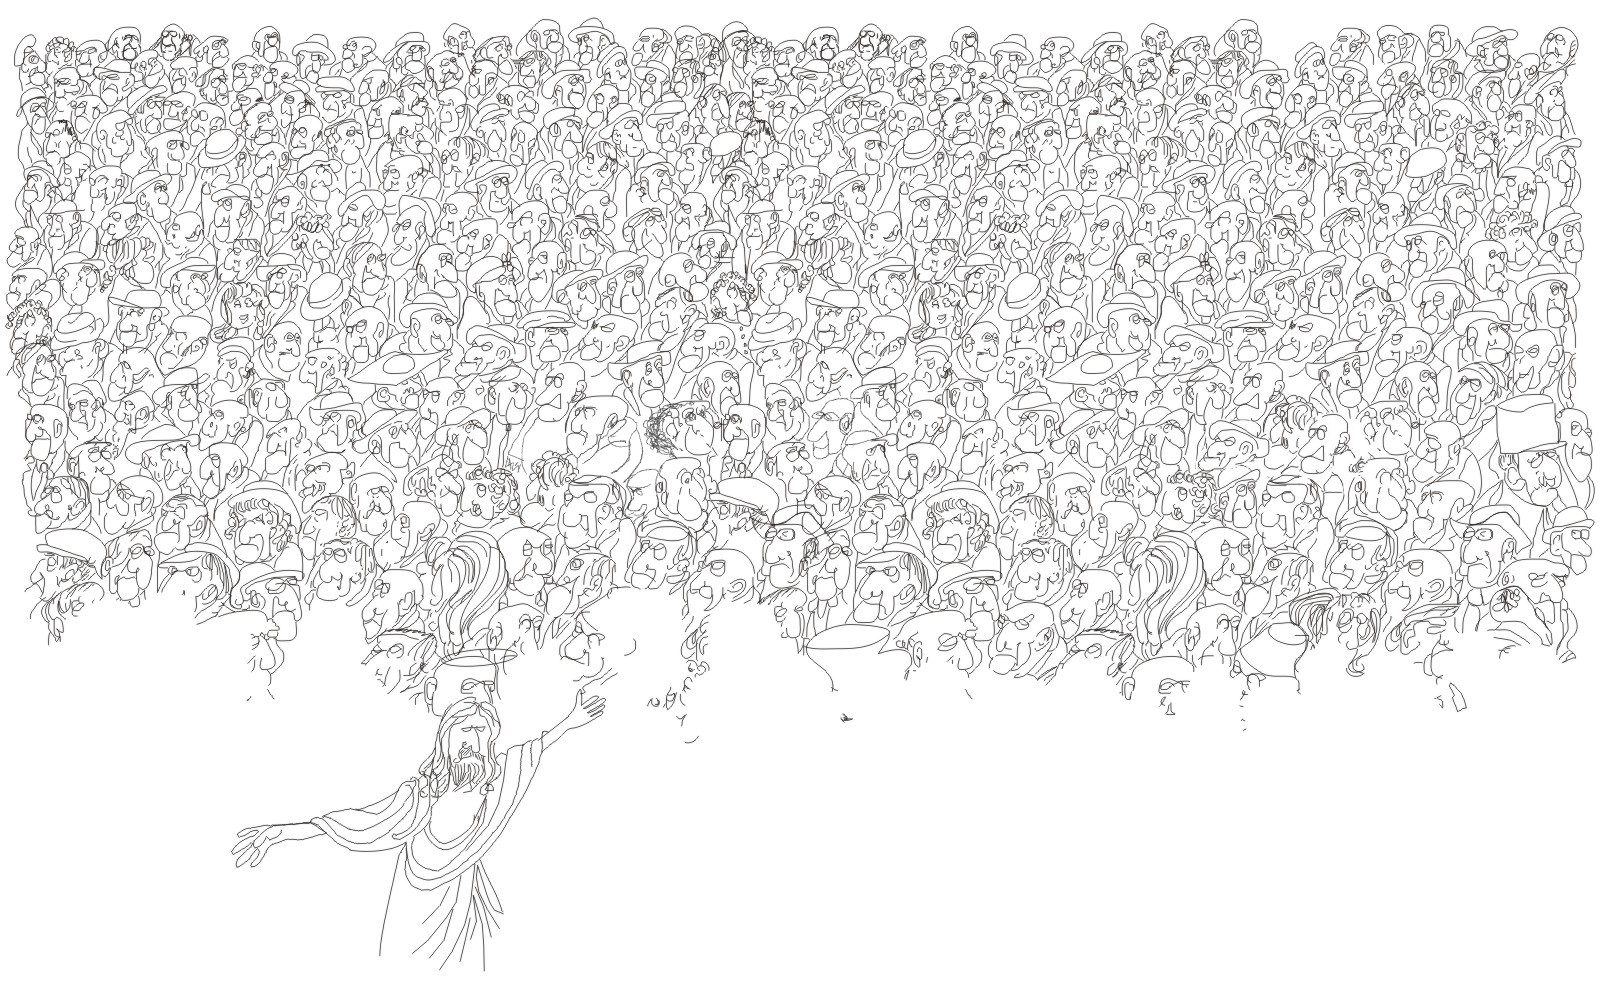 Drawn crowd H P obama speech